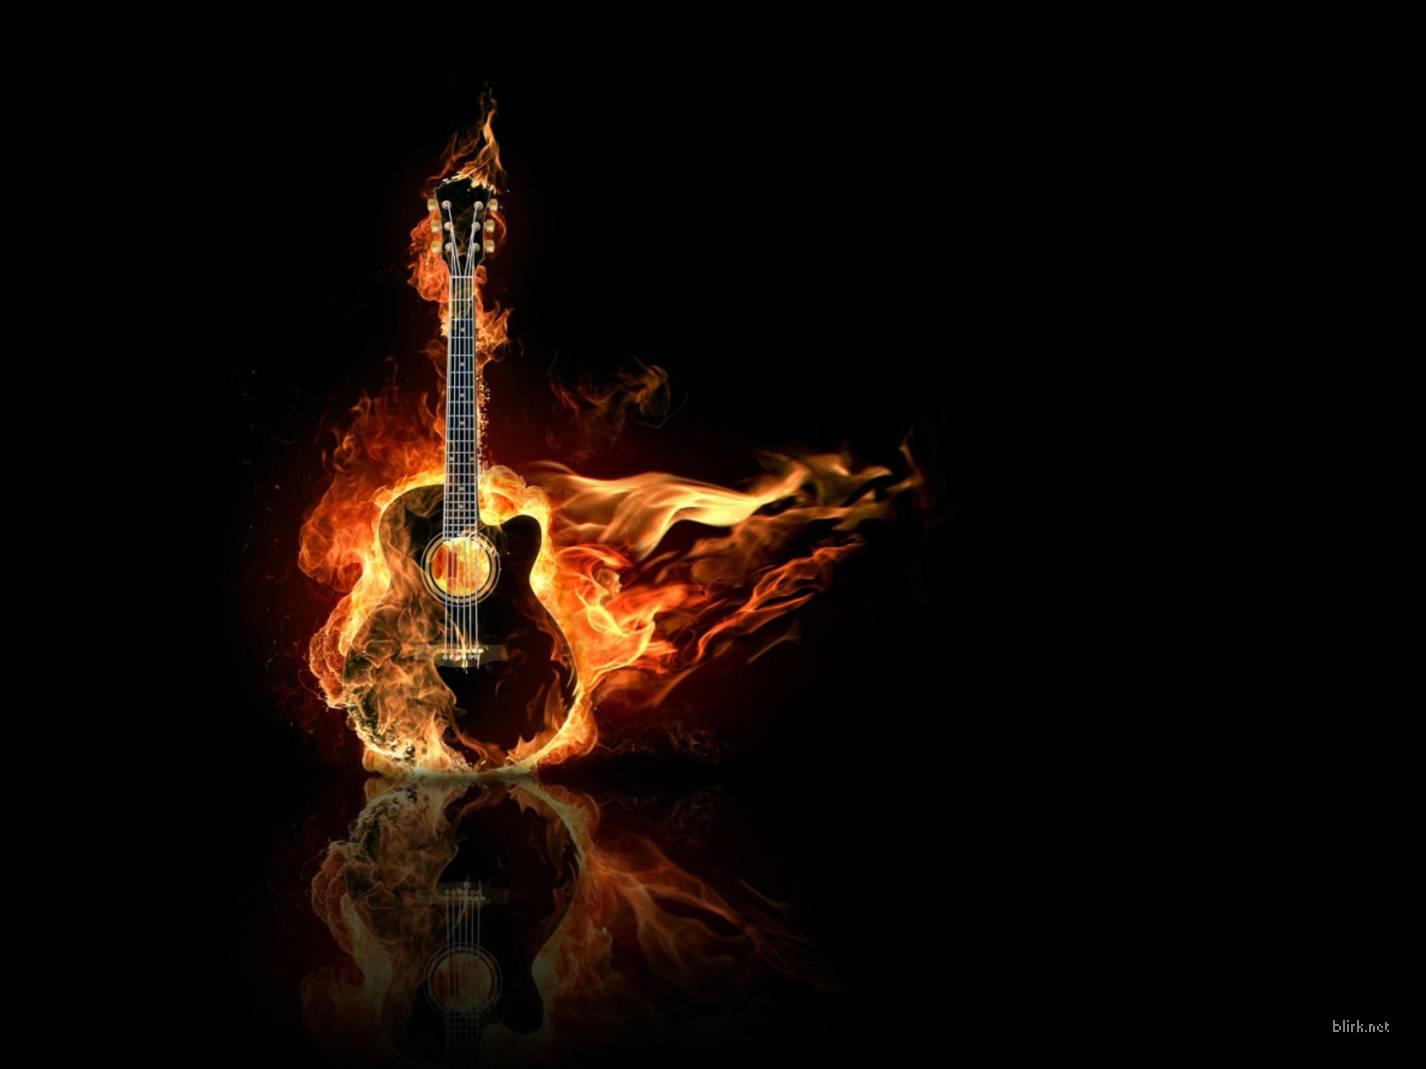 Rockstar Guitar Wallpaper By Tariq999 Fa Free On Zedge